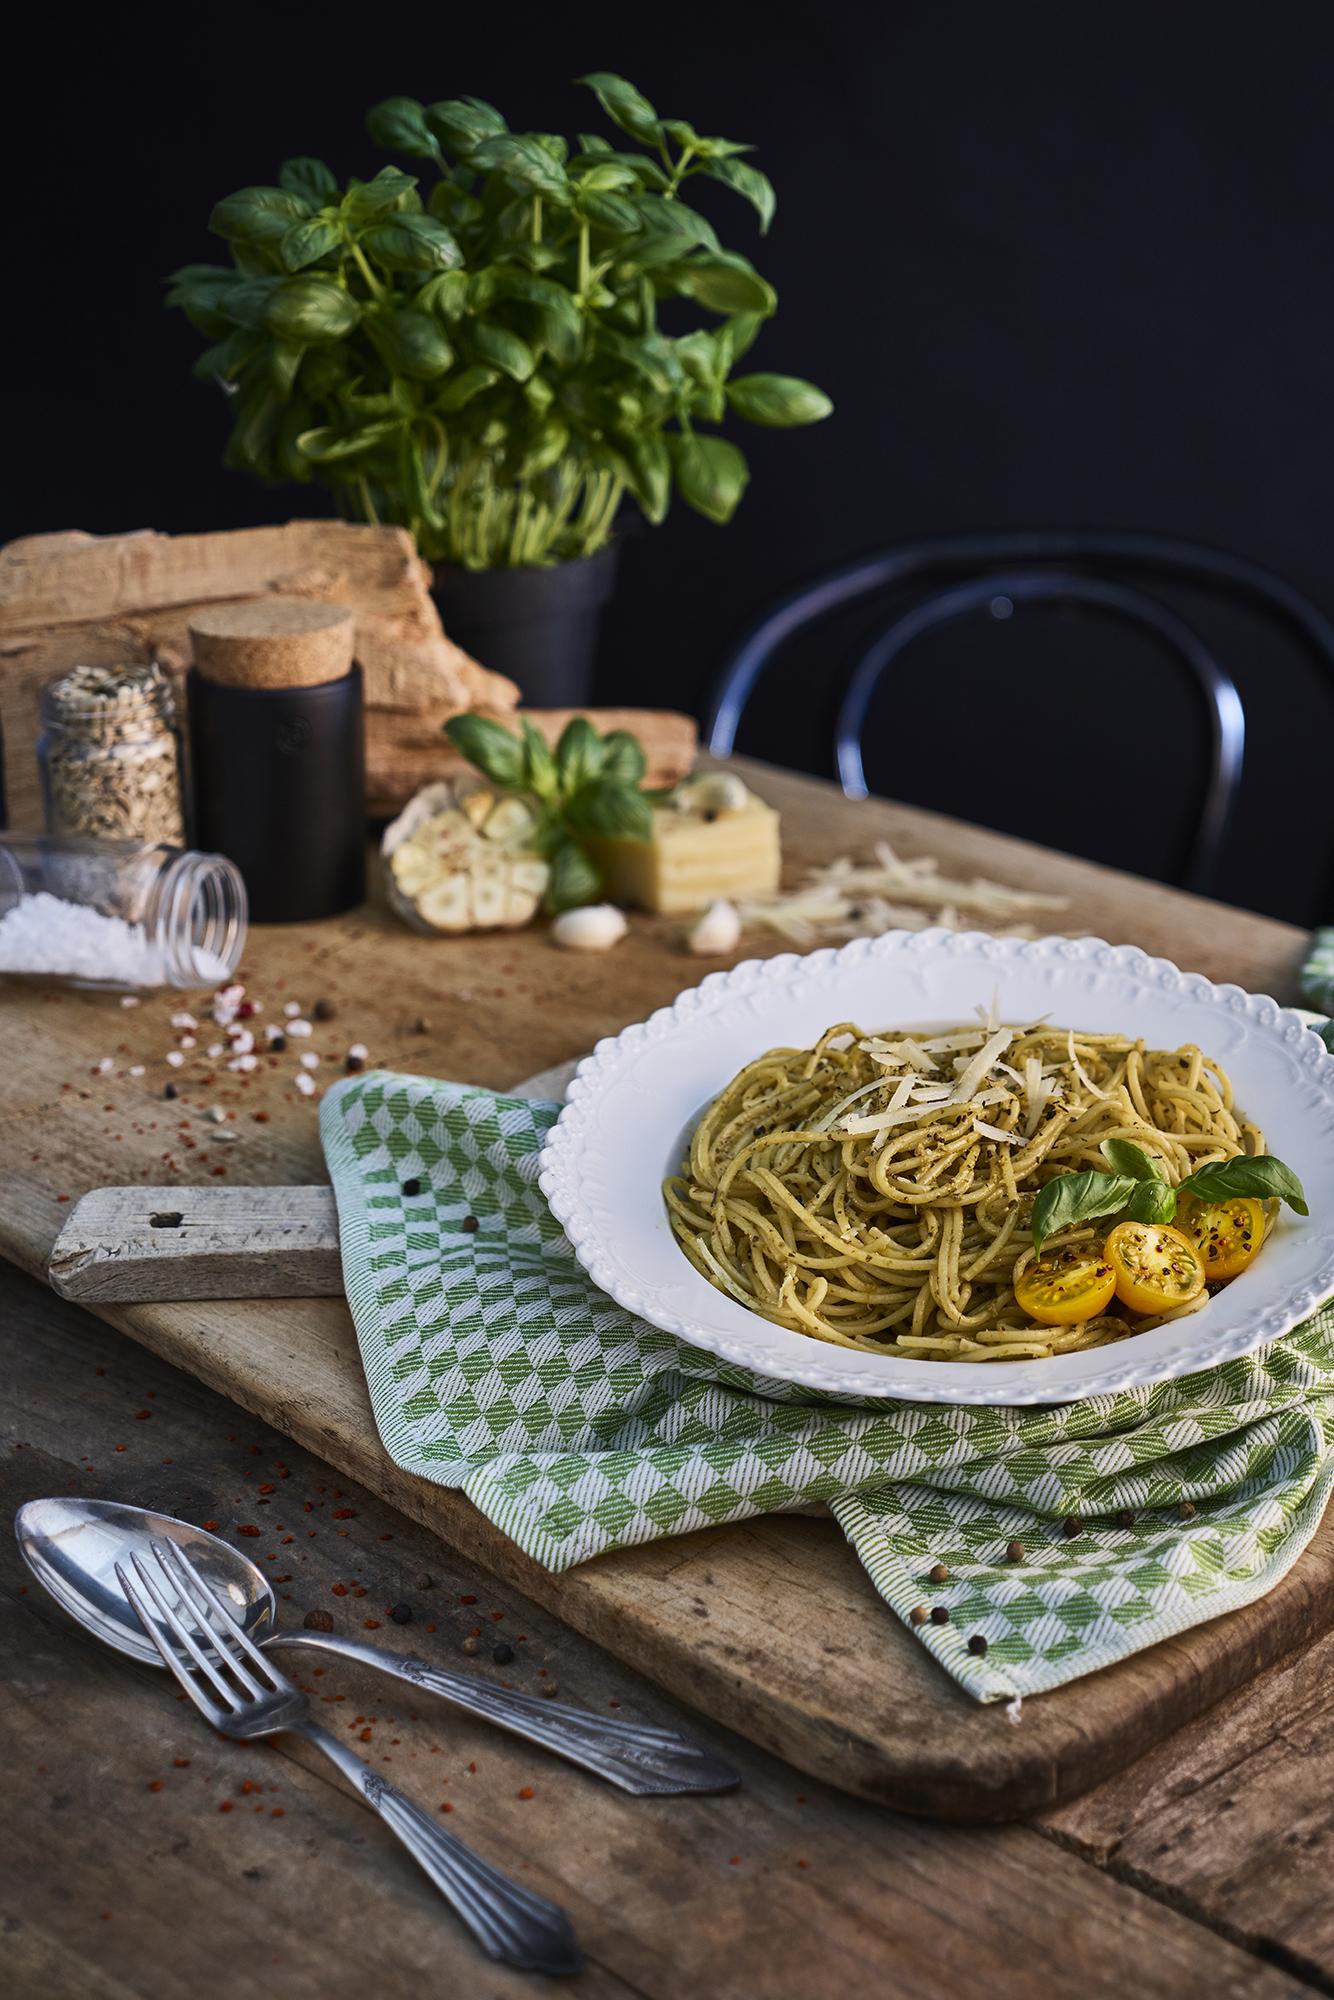 pasta-food-foodfotografie-moody-modern-pesto-basilikum-parmesa-werbefotografie-cool-wlachopulos-modernefoodfotografie-koblenz-köln-bonn-frankfurt